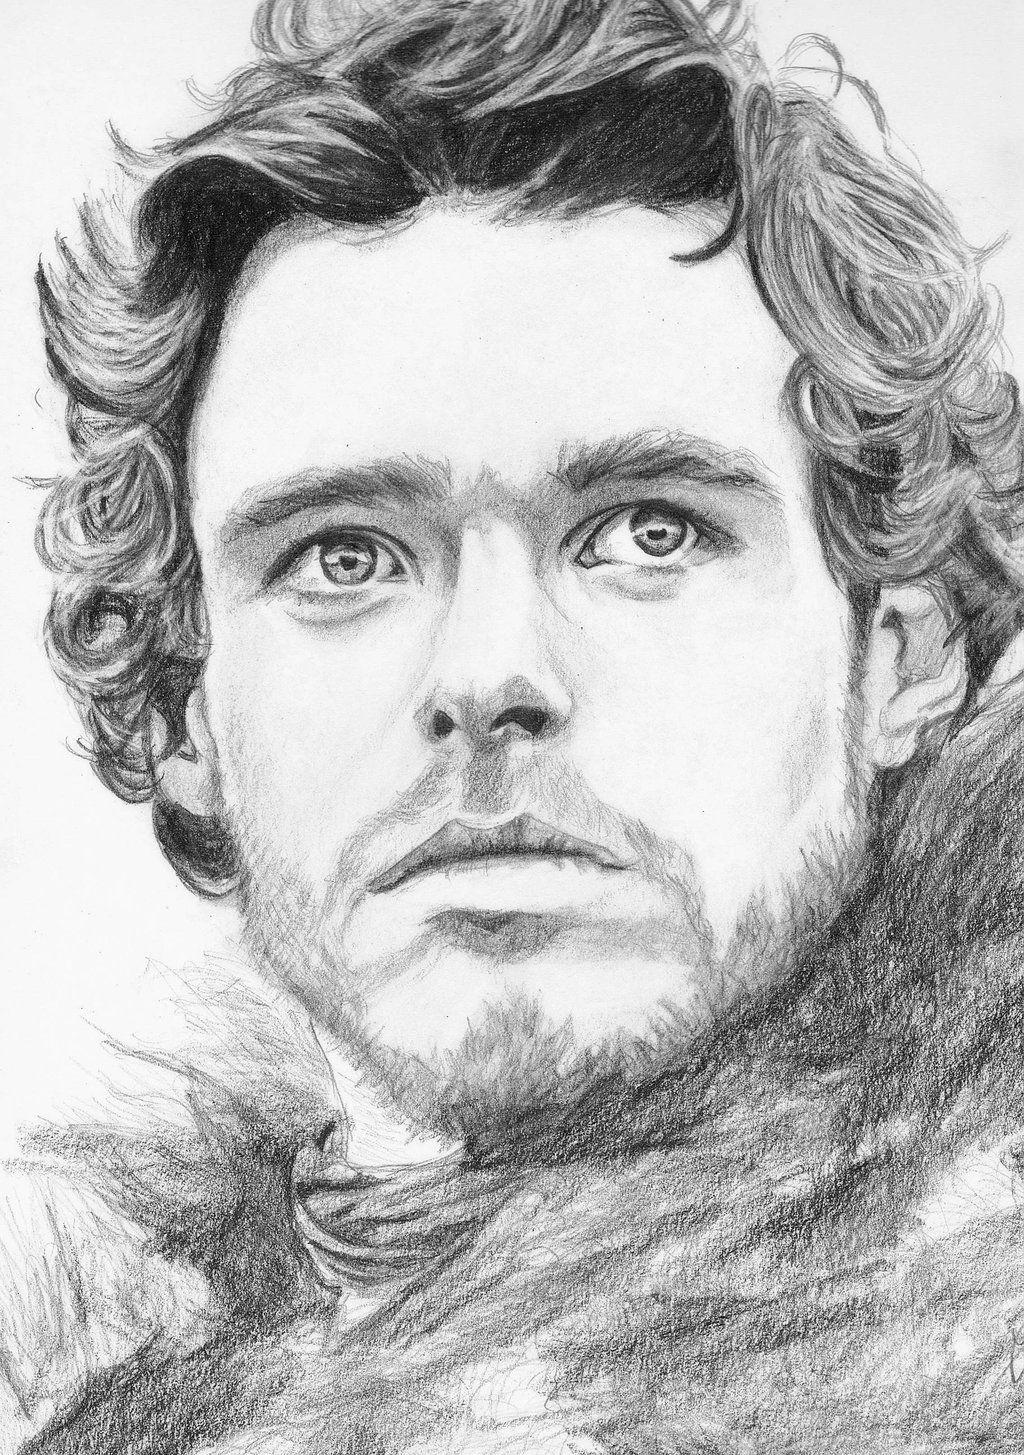 Robb Stark by crysaniasea.deviantart.com on @deviantART ...